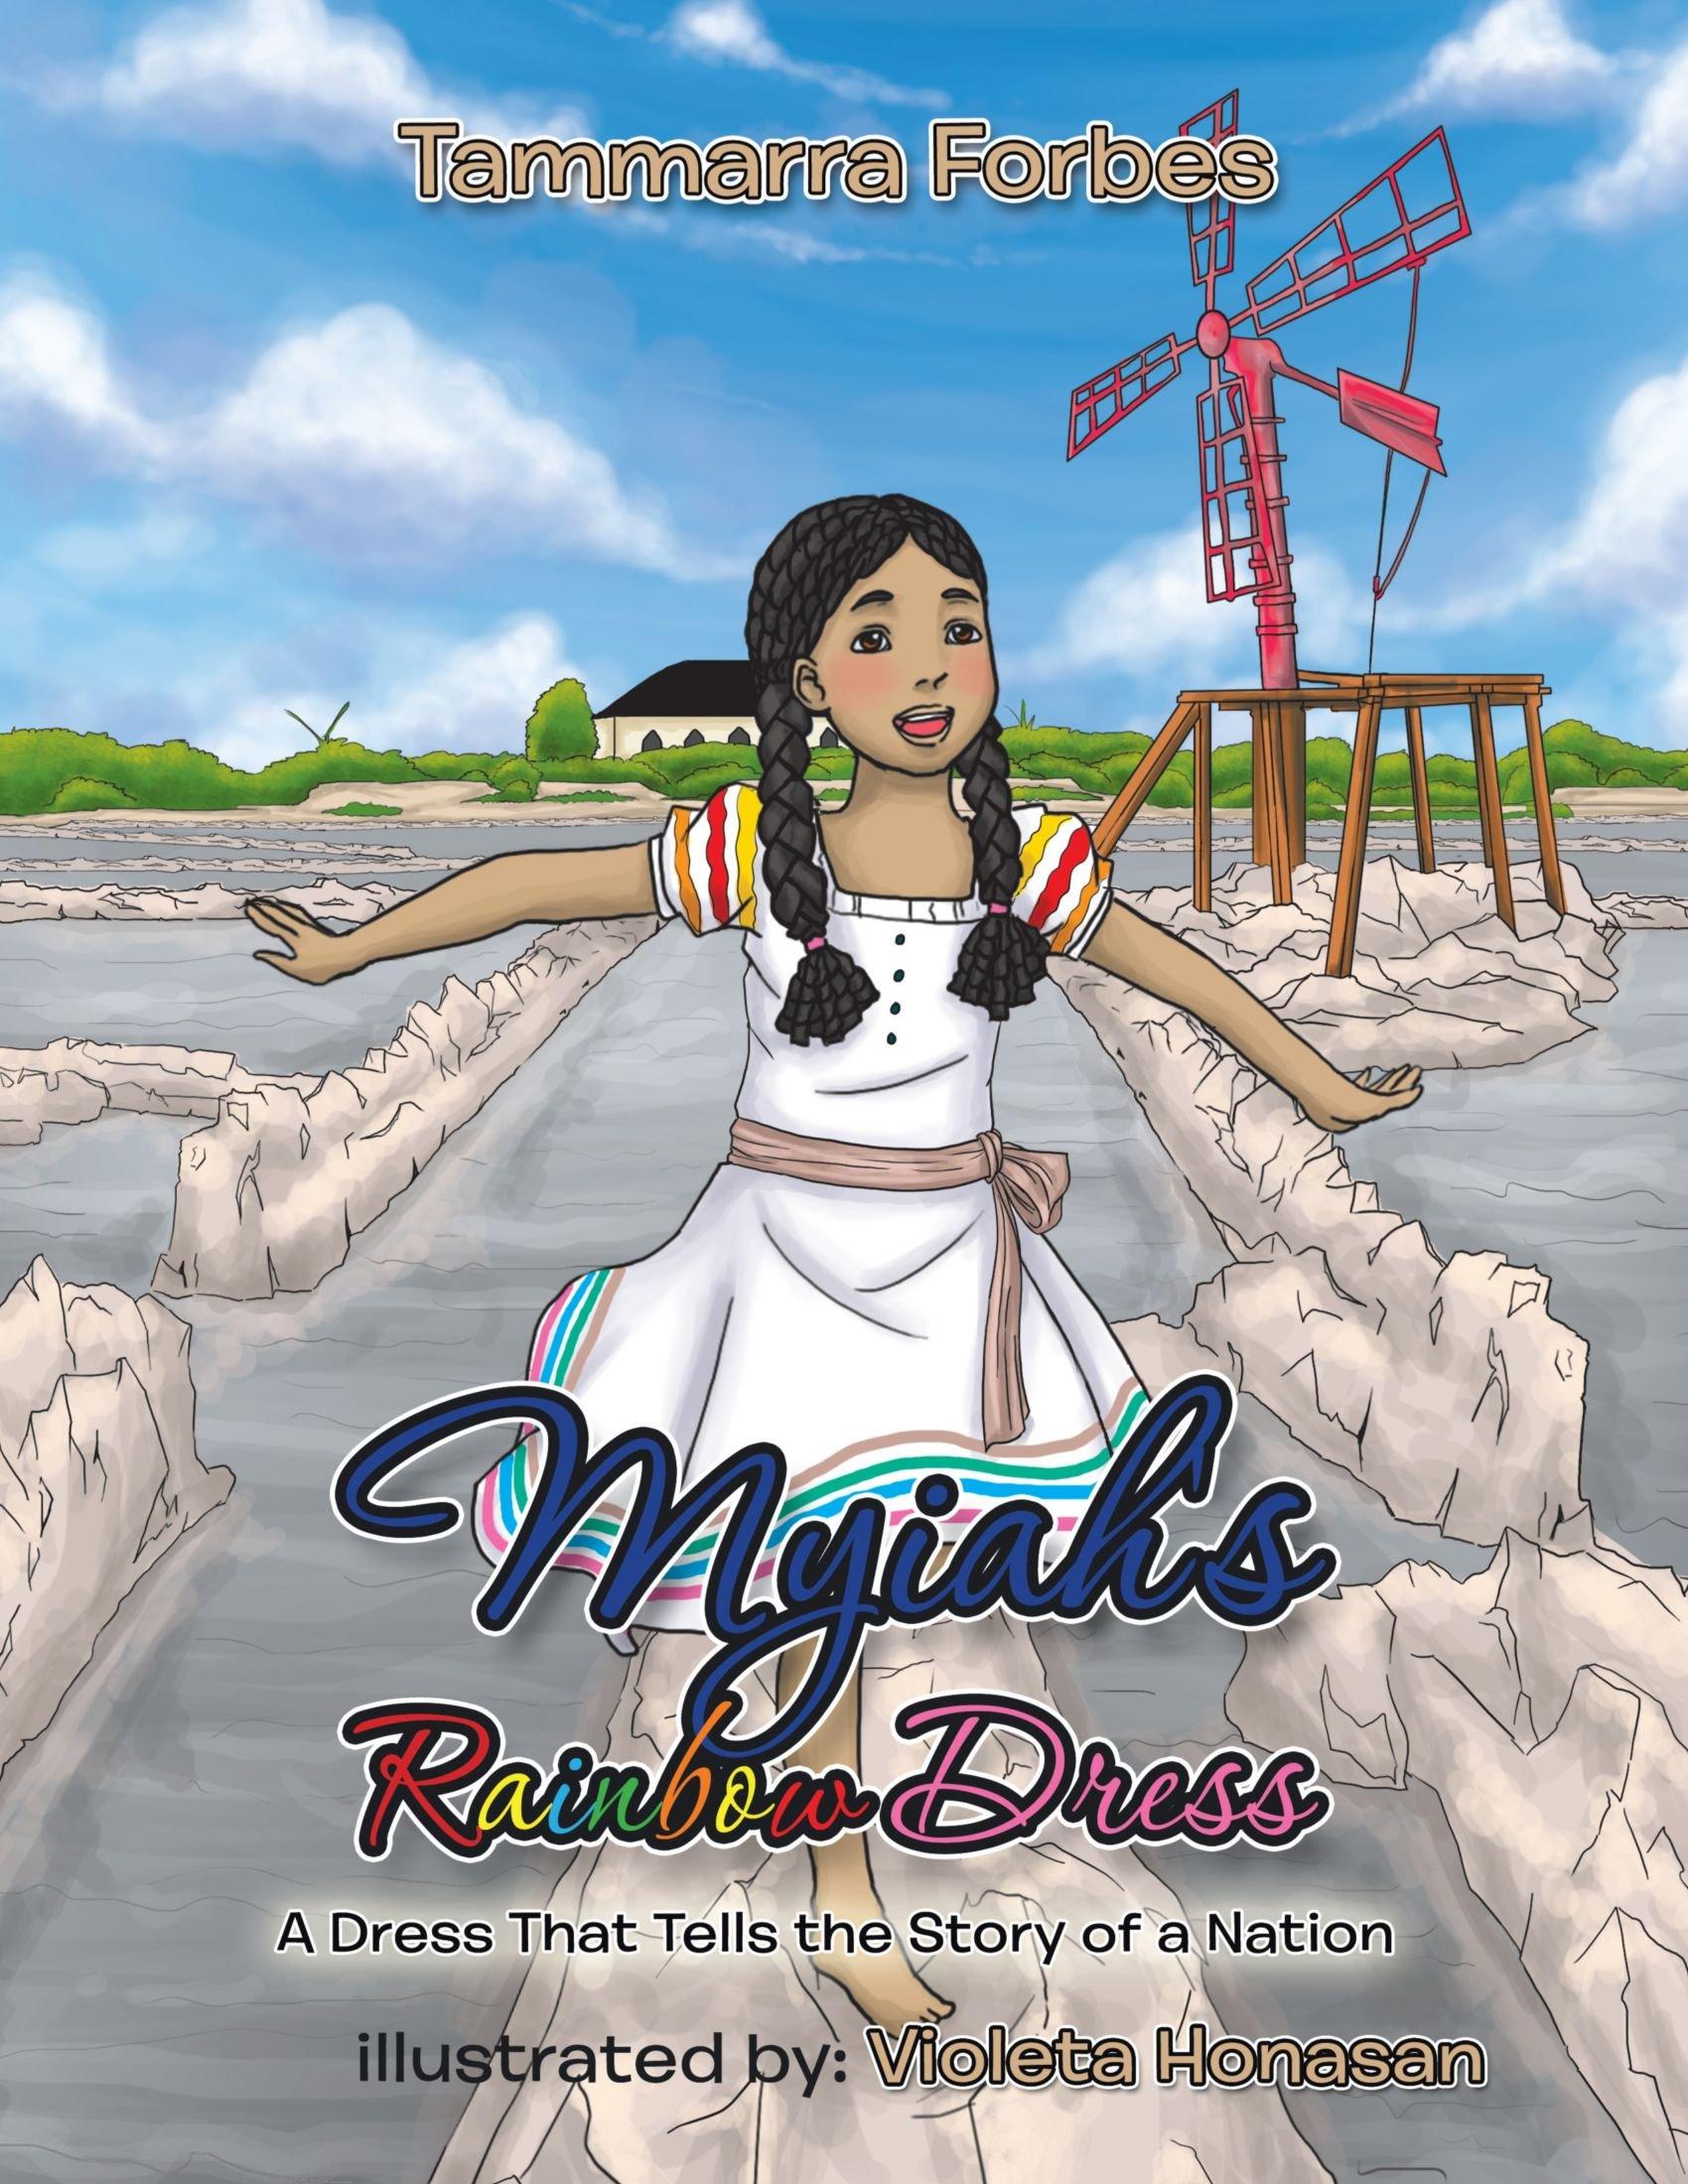 Myiahs Rainbow Dress: A Dress That Tells the Story of a Nation